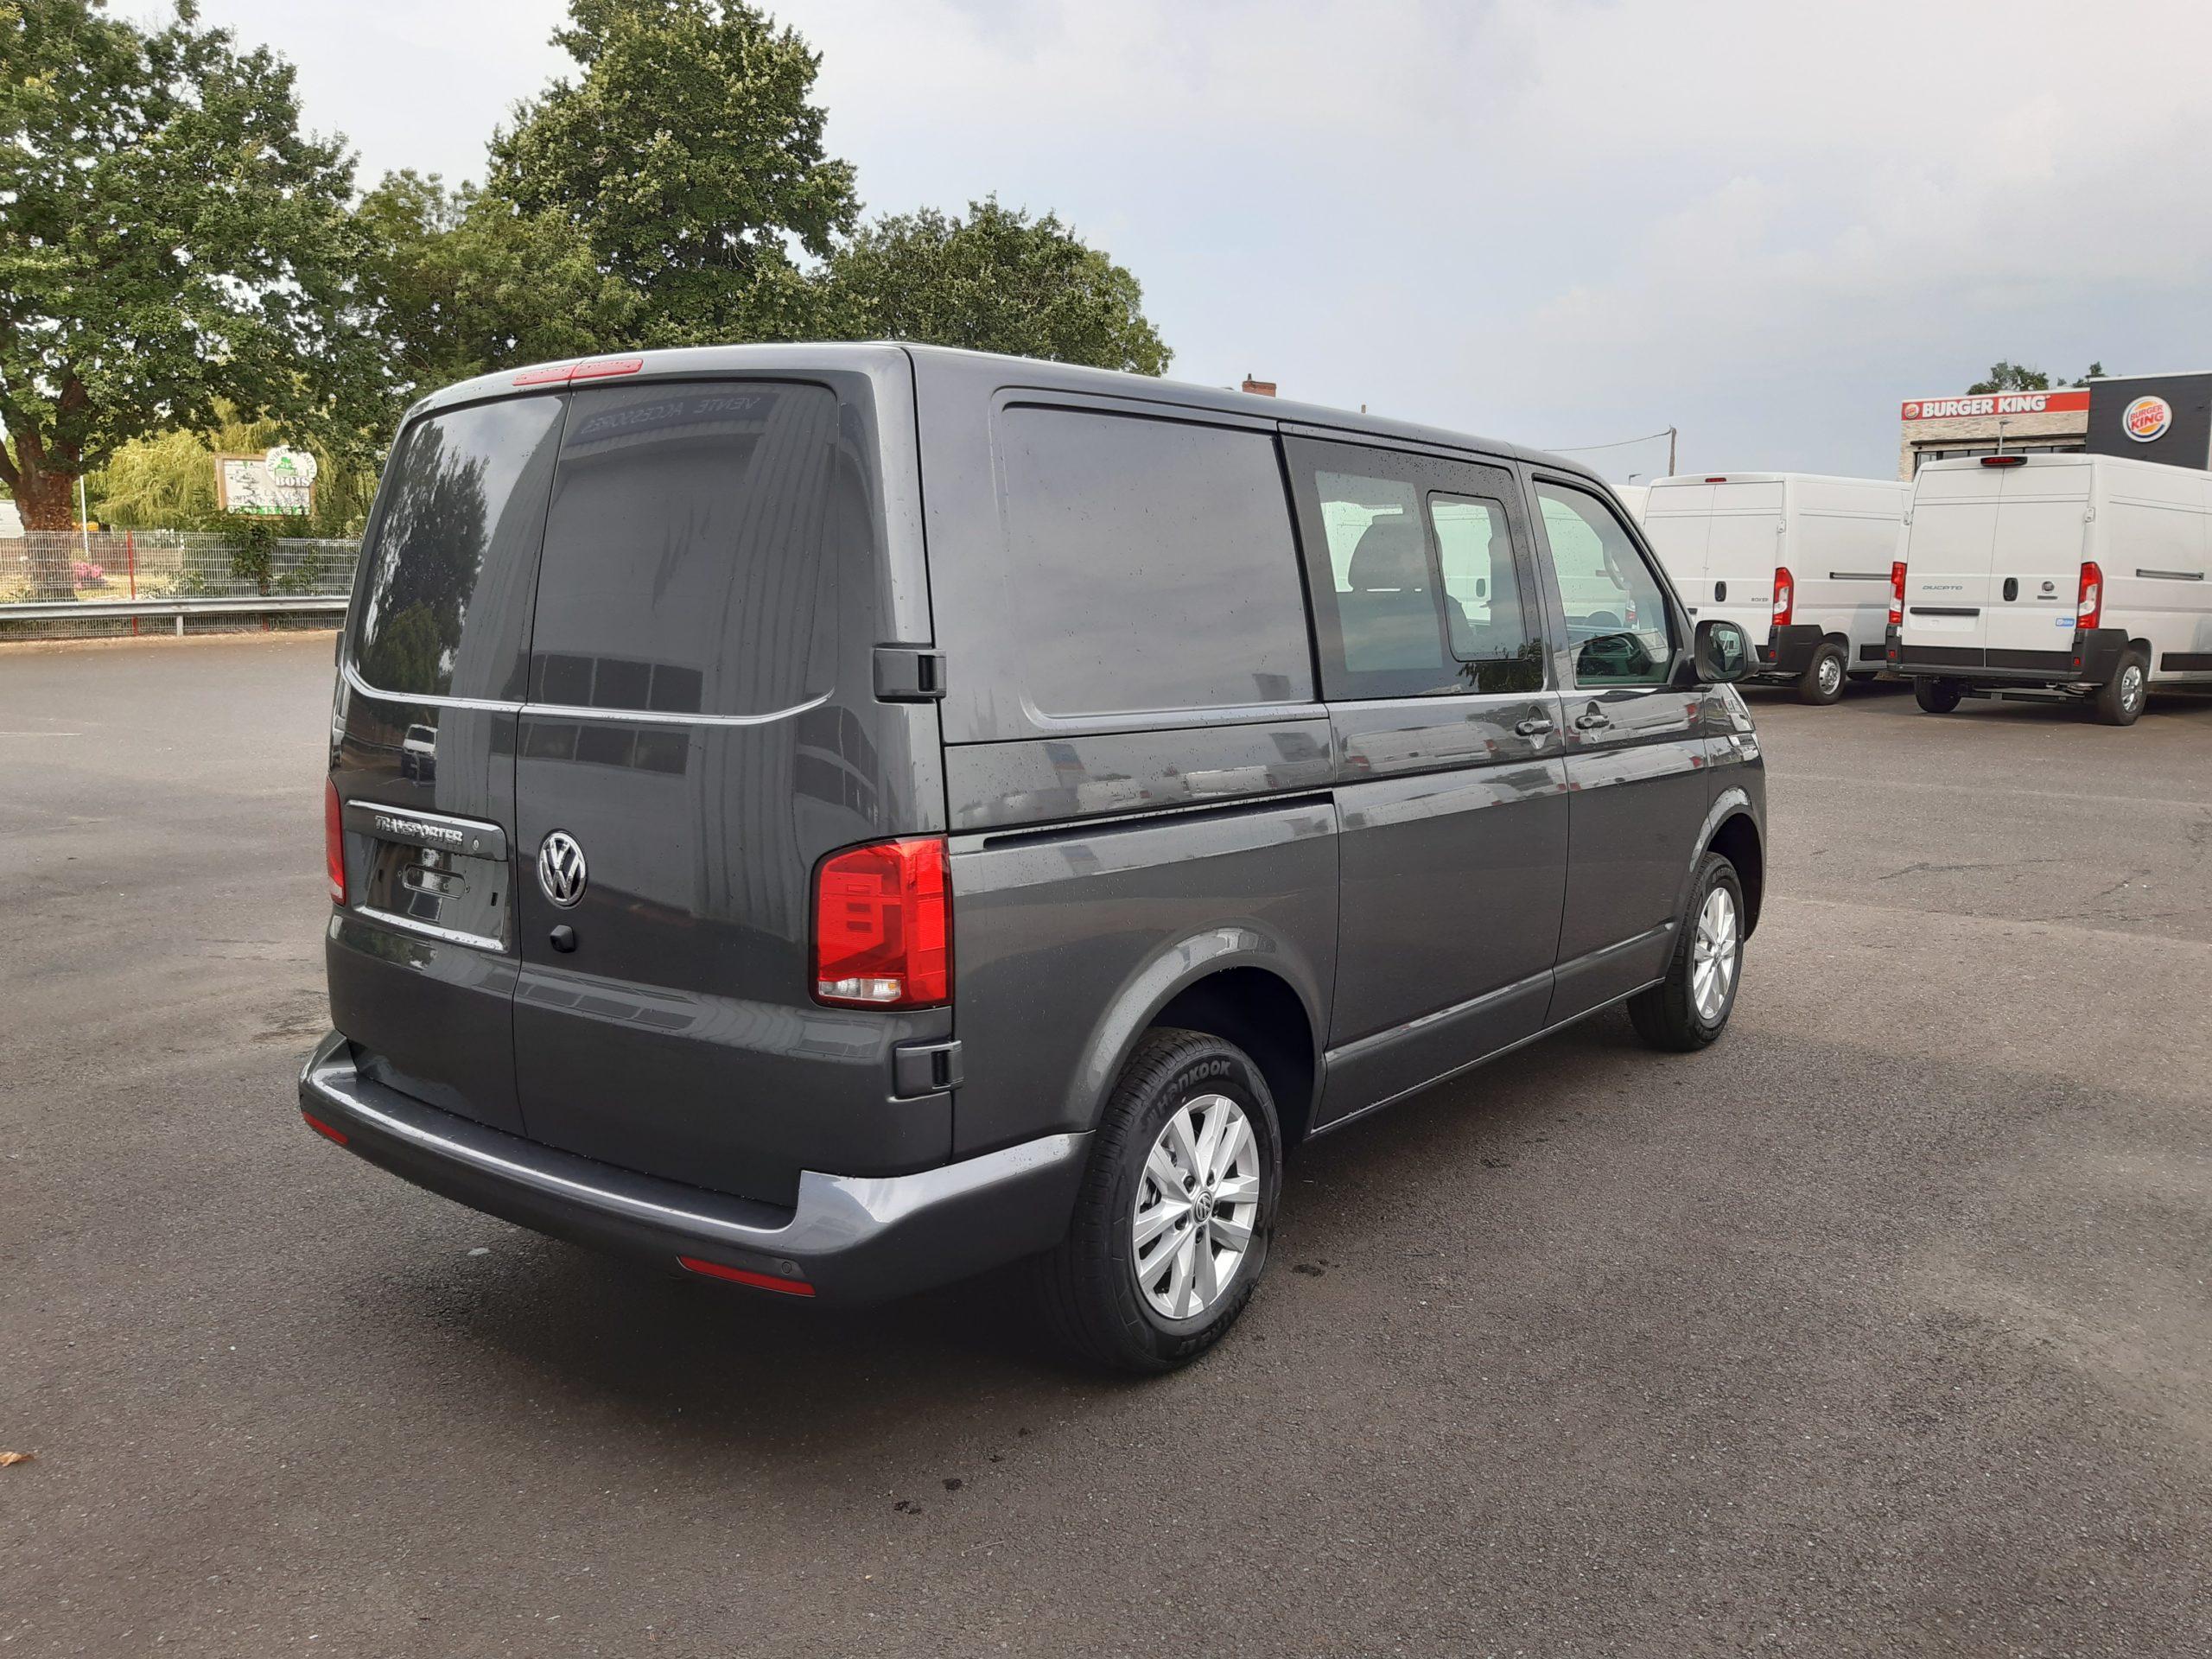 Location d'un fourgon compact double cabine - Volkswagen T6-1 Cabine APP - Vue4